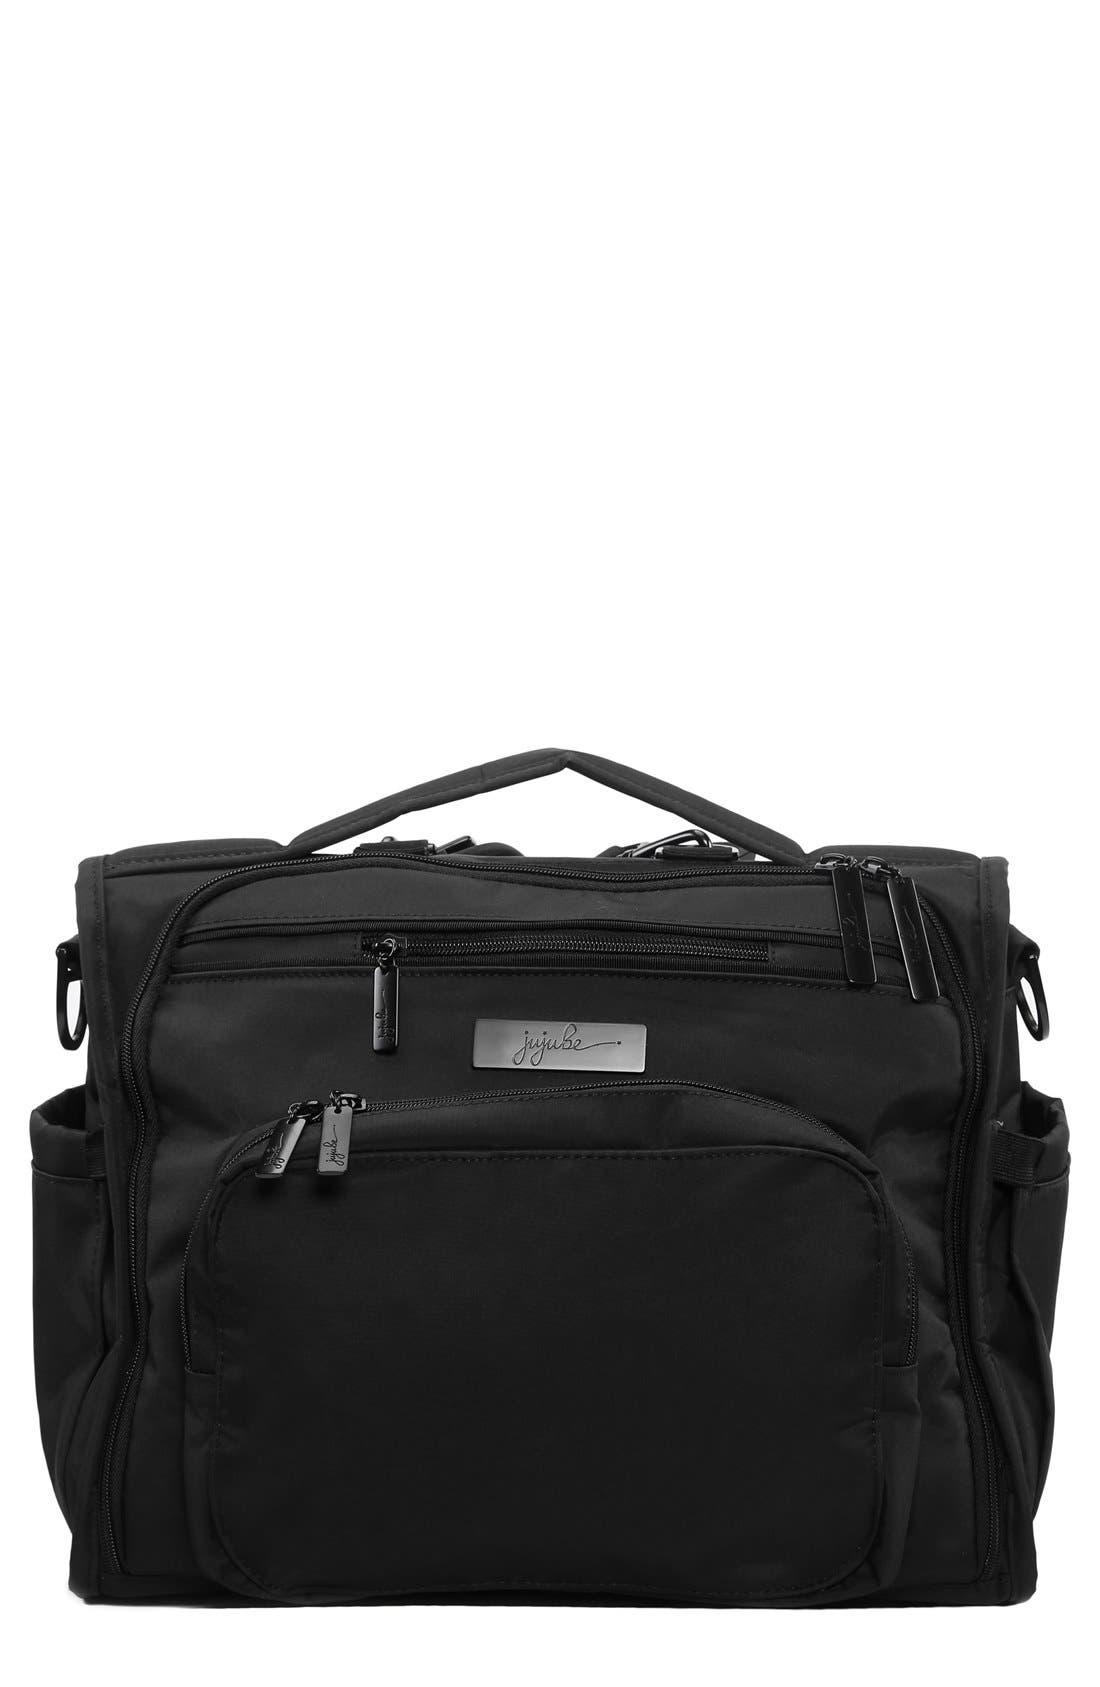 Alternate Image 1 Selected - Ju-Ju-Be 'BFF - Onyx Collection' Diaper Bag